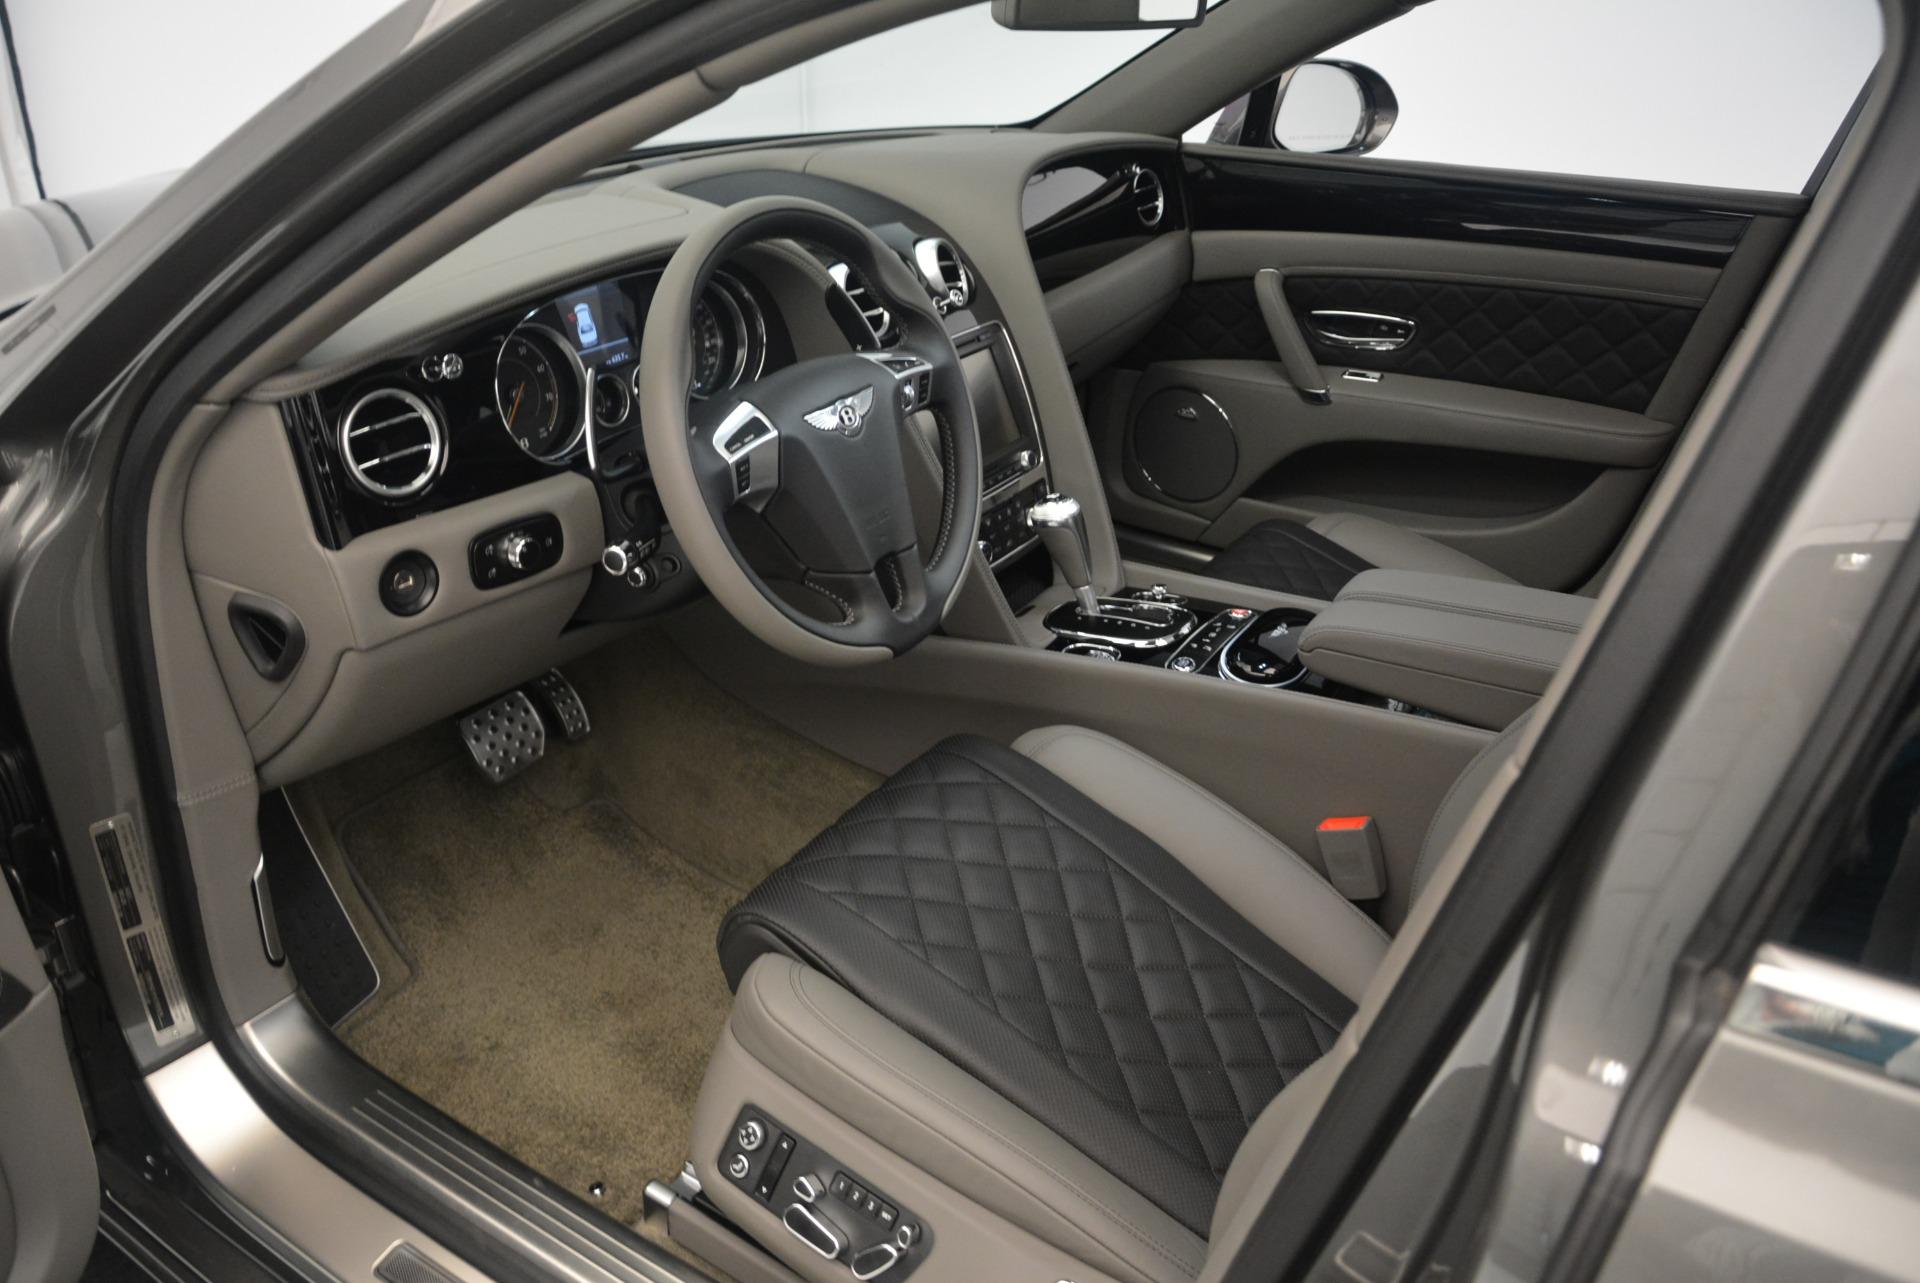 Used 2017 Bentley Flying Spur V8 S For Sale In Westport, CT 2263_p18